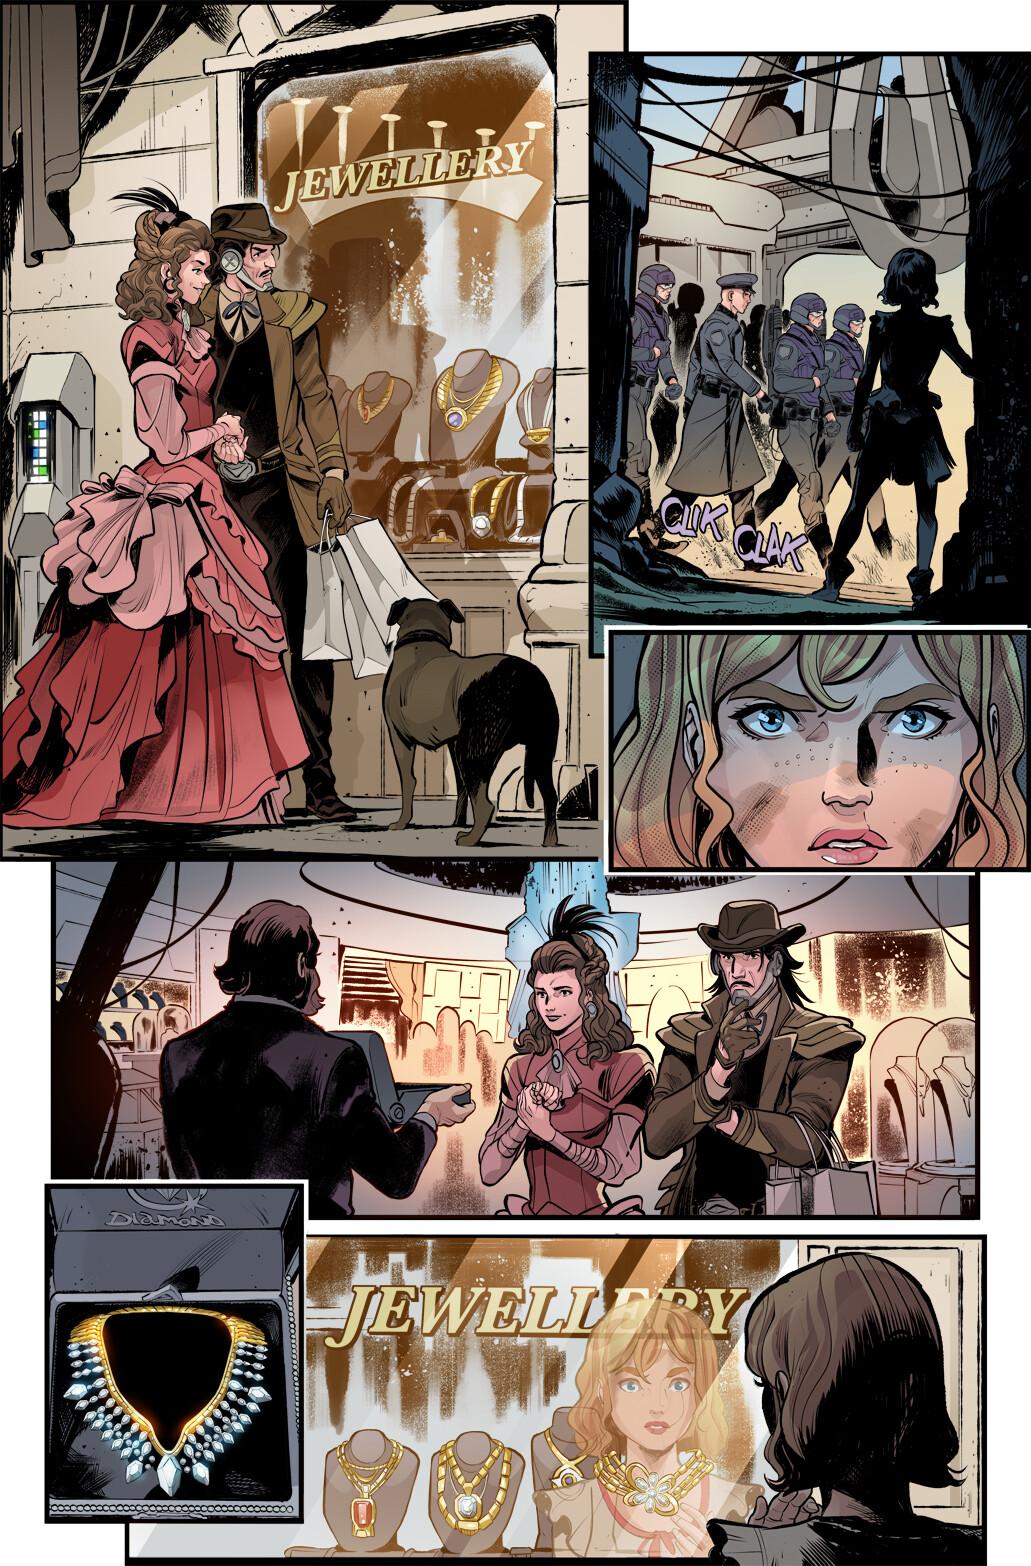 Firefly: Bad Company, Page 1